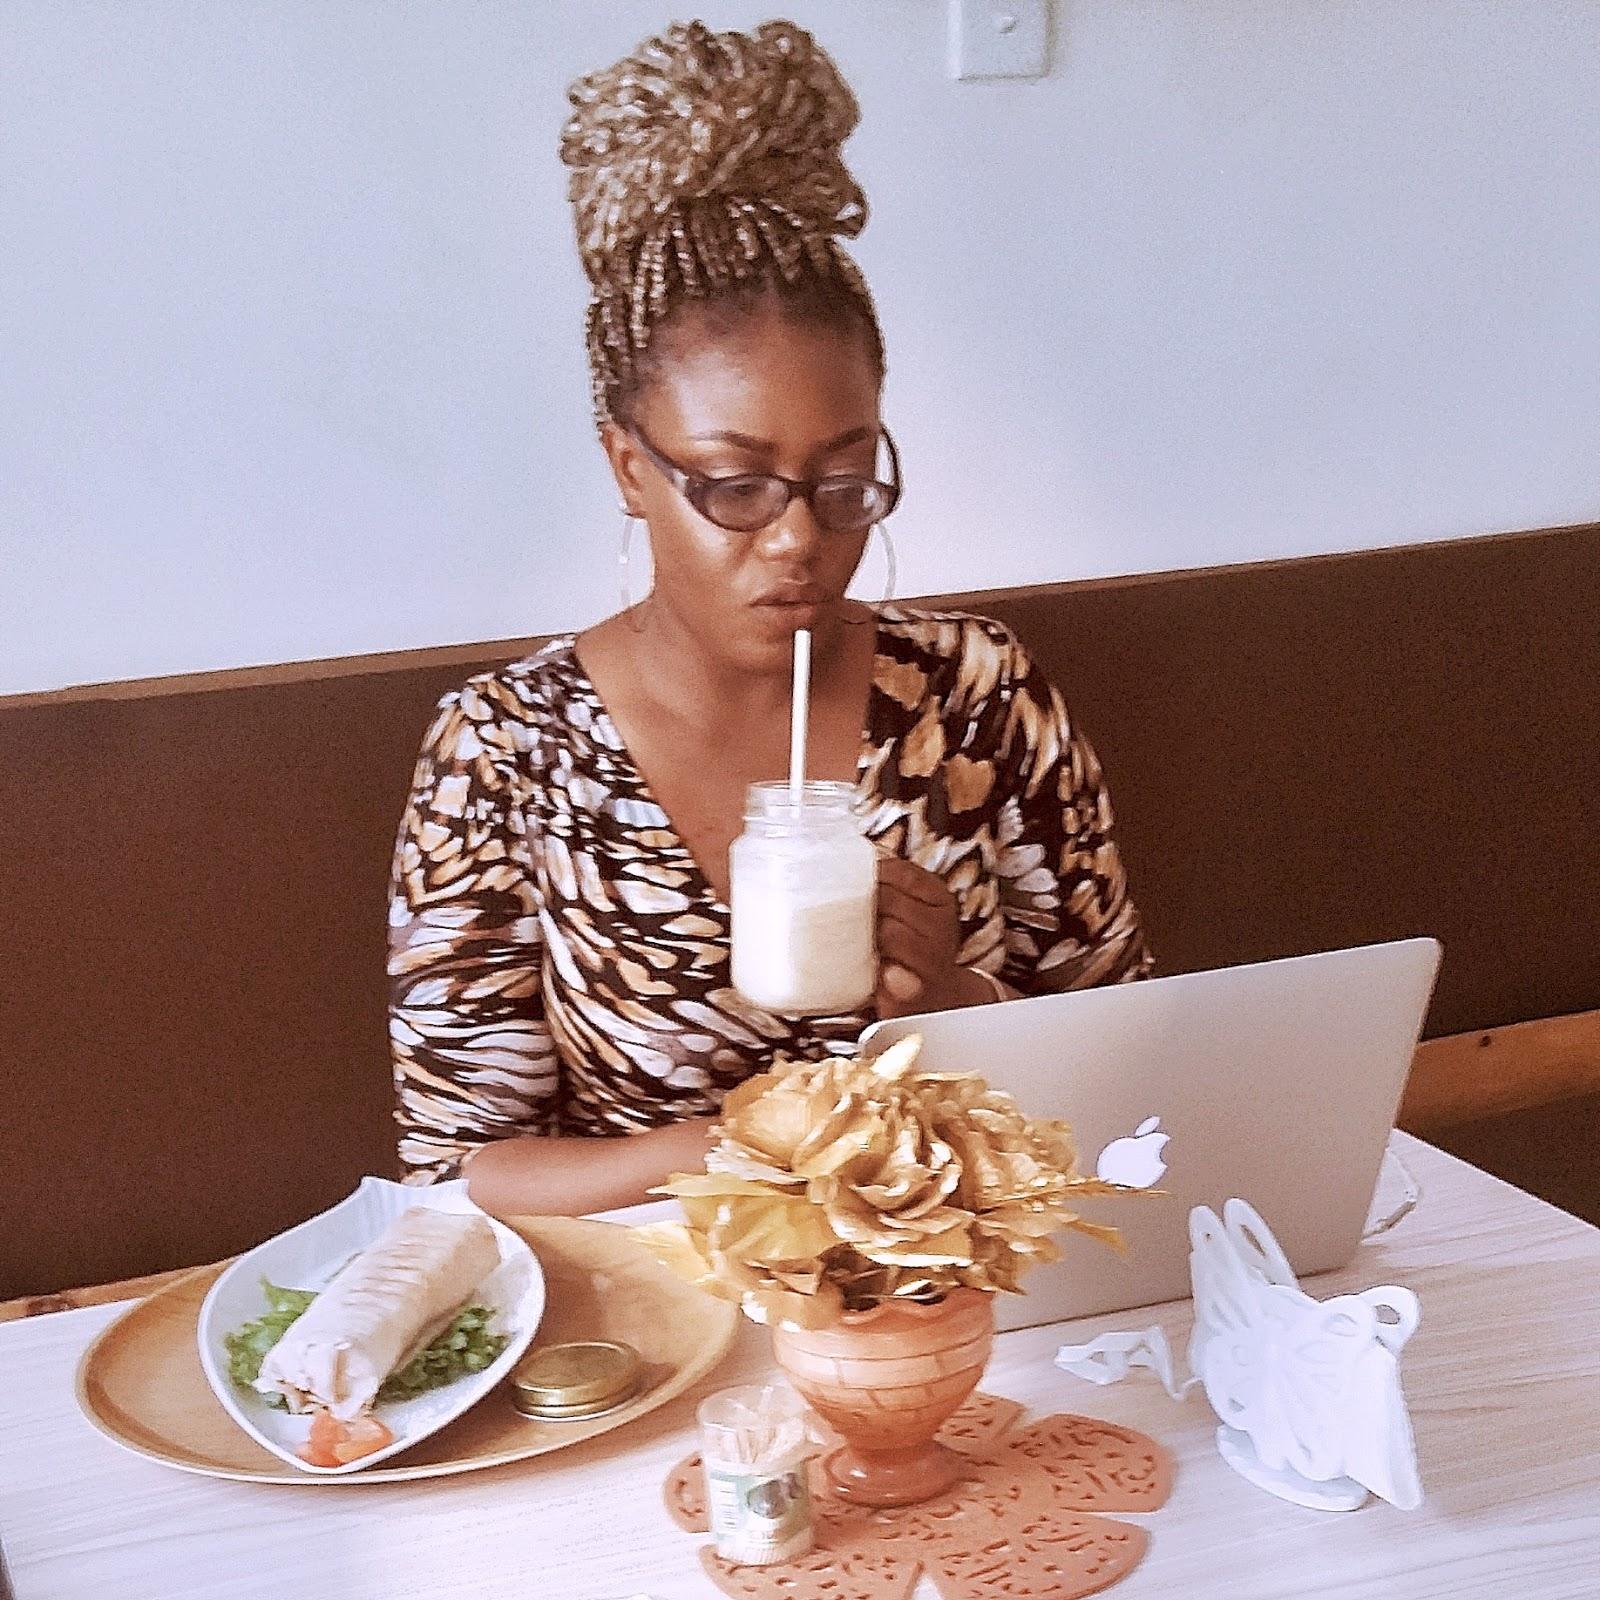 Alone-Time At Nutrihit Cafe